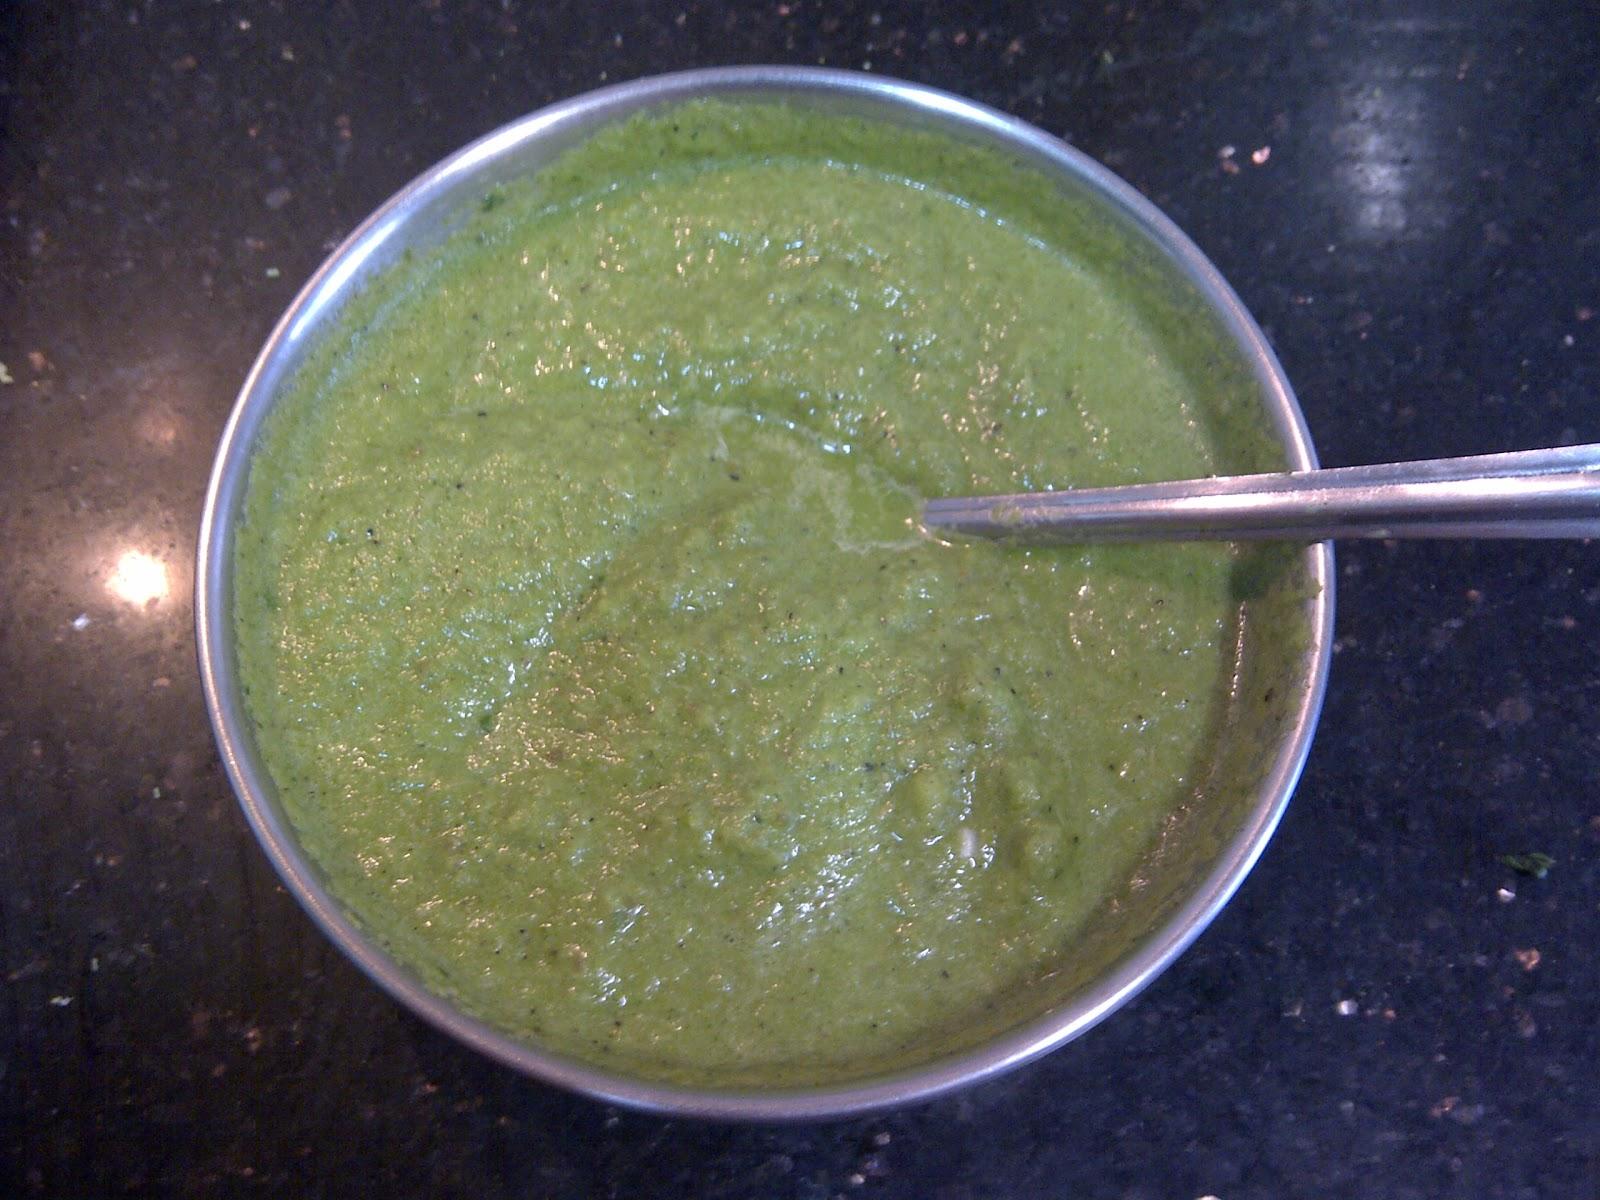 AMU'S RECIPES: Thai Green Curry Paste